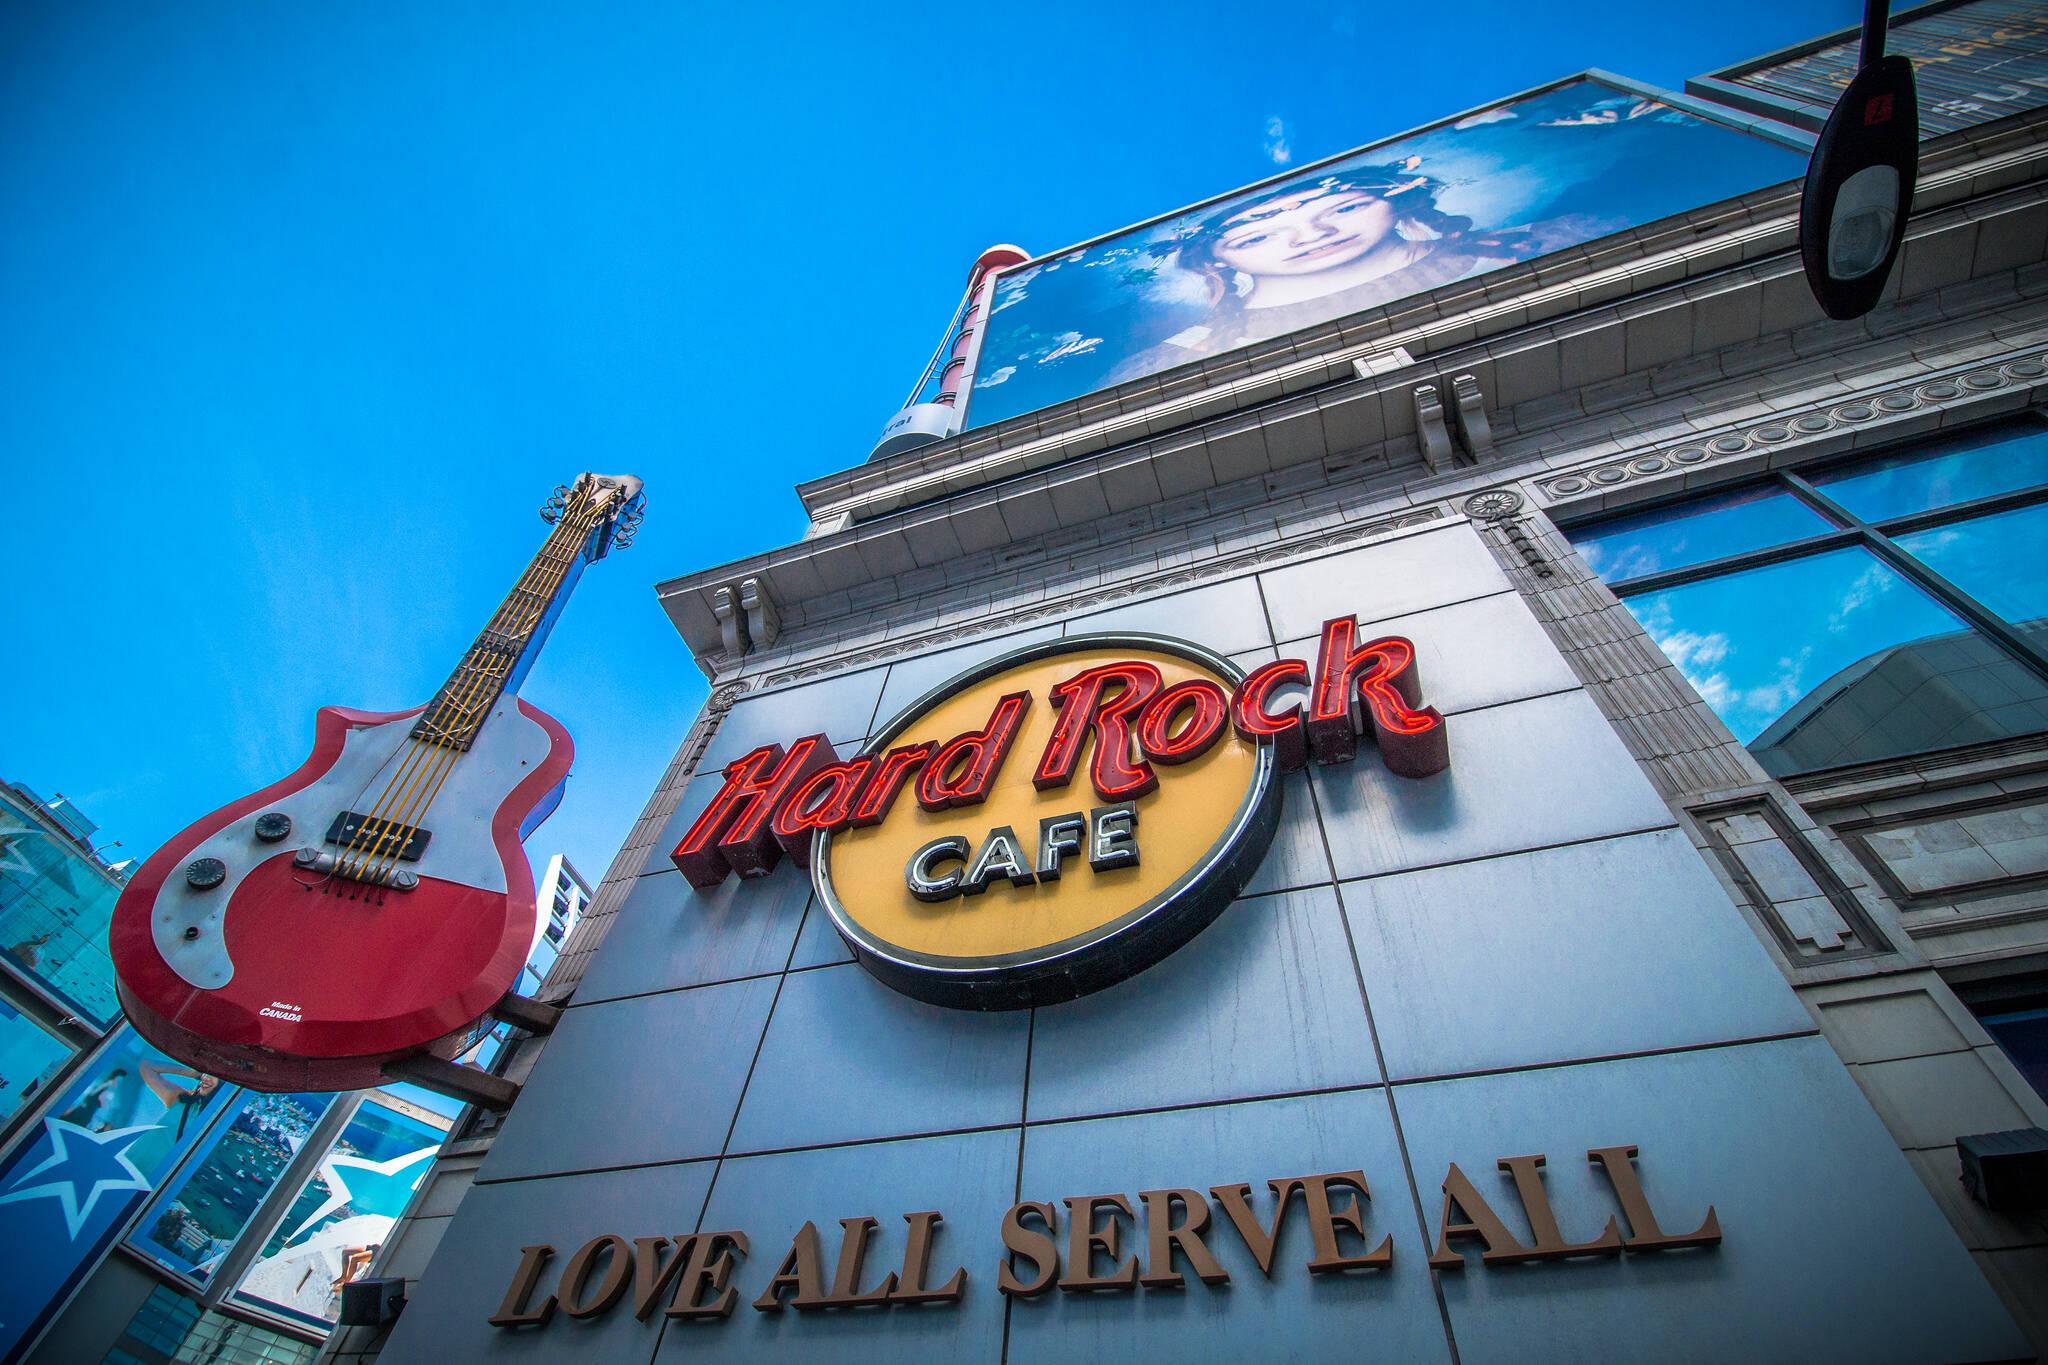 toronto hard rock cafe